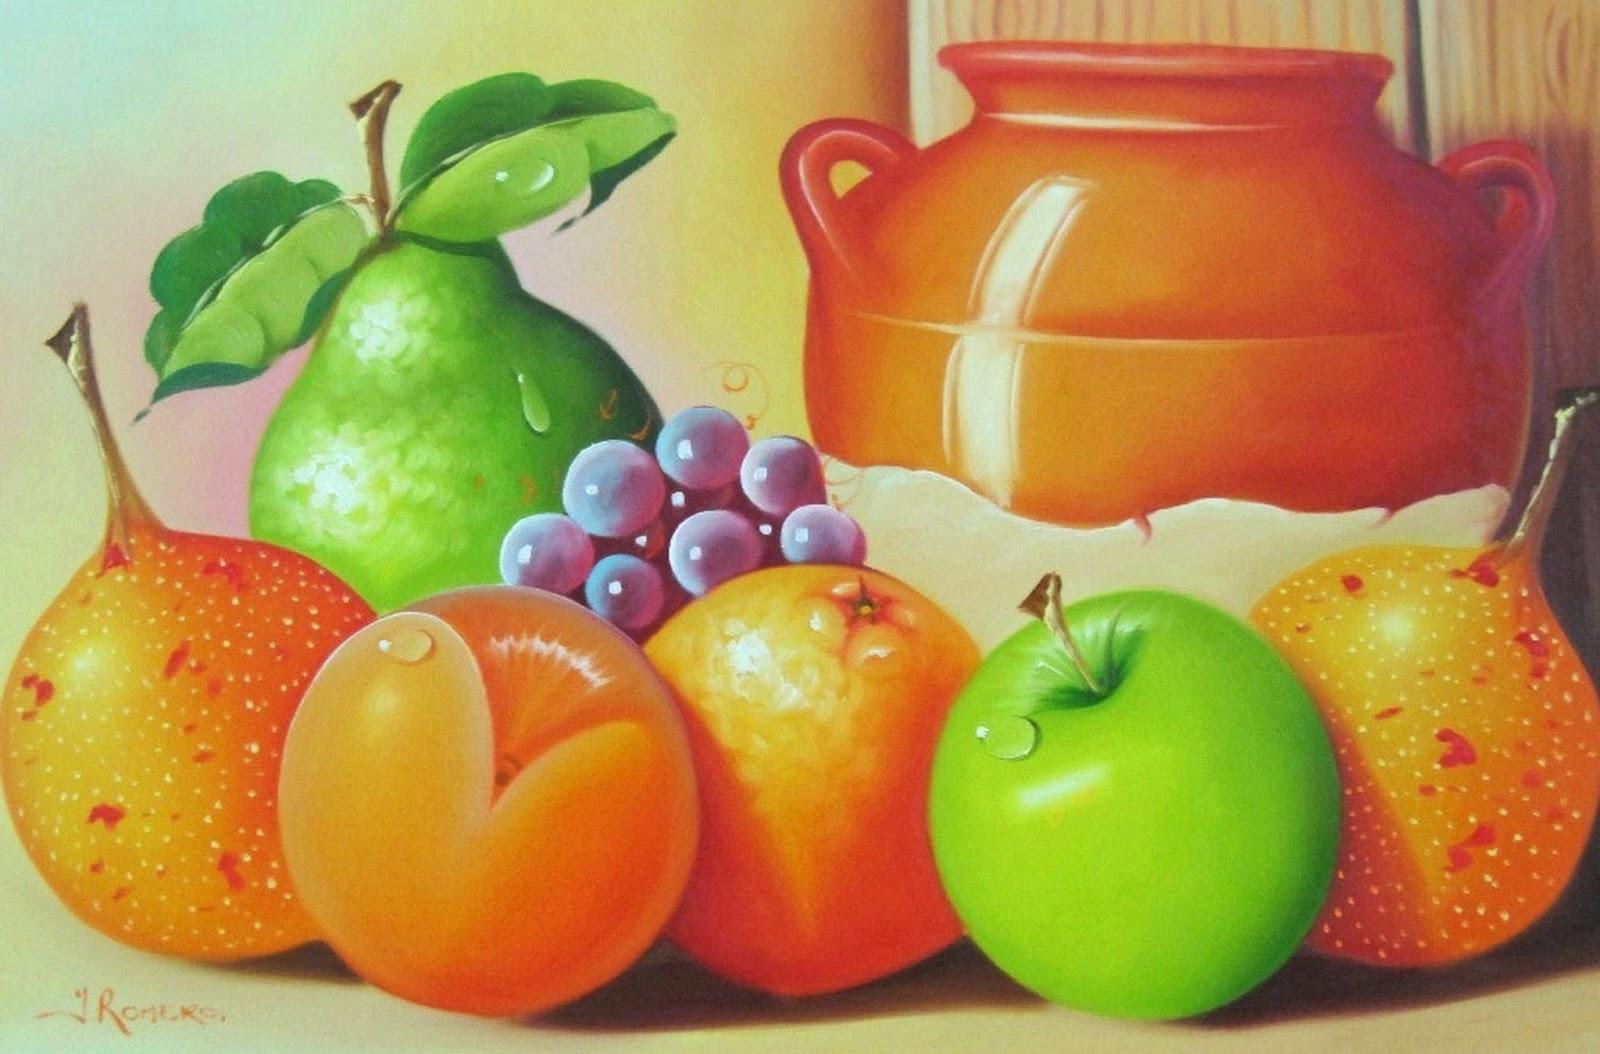 Cuadros modernos pinturas y dibujos 07 24 13 - Cuadros decorativos para cocina abstractos modernos ...